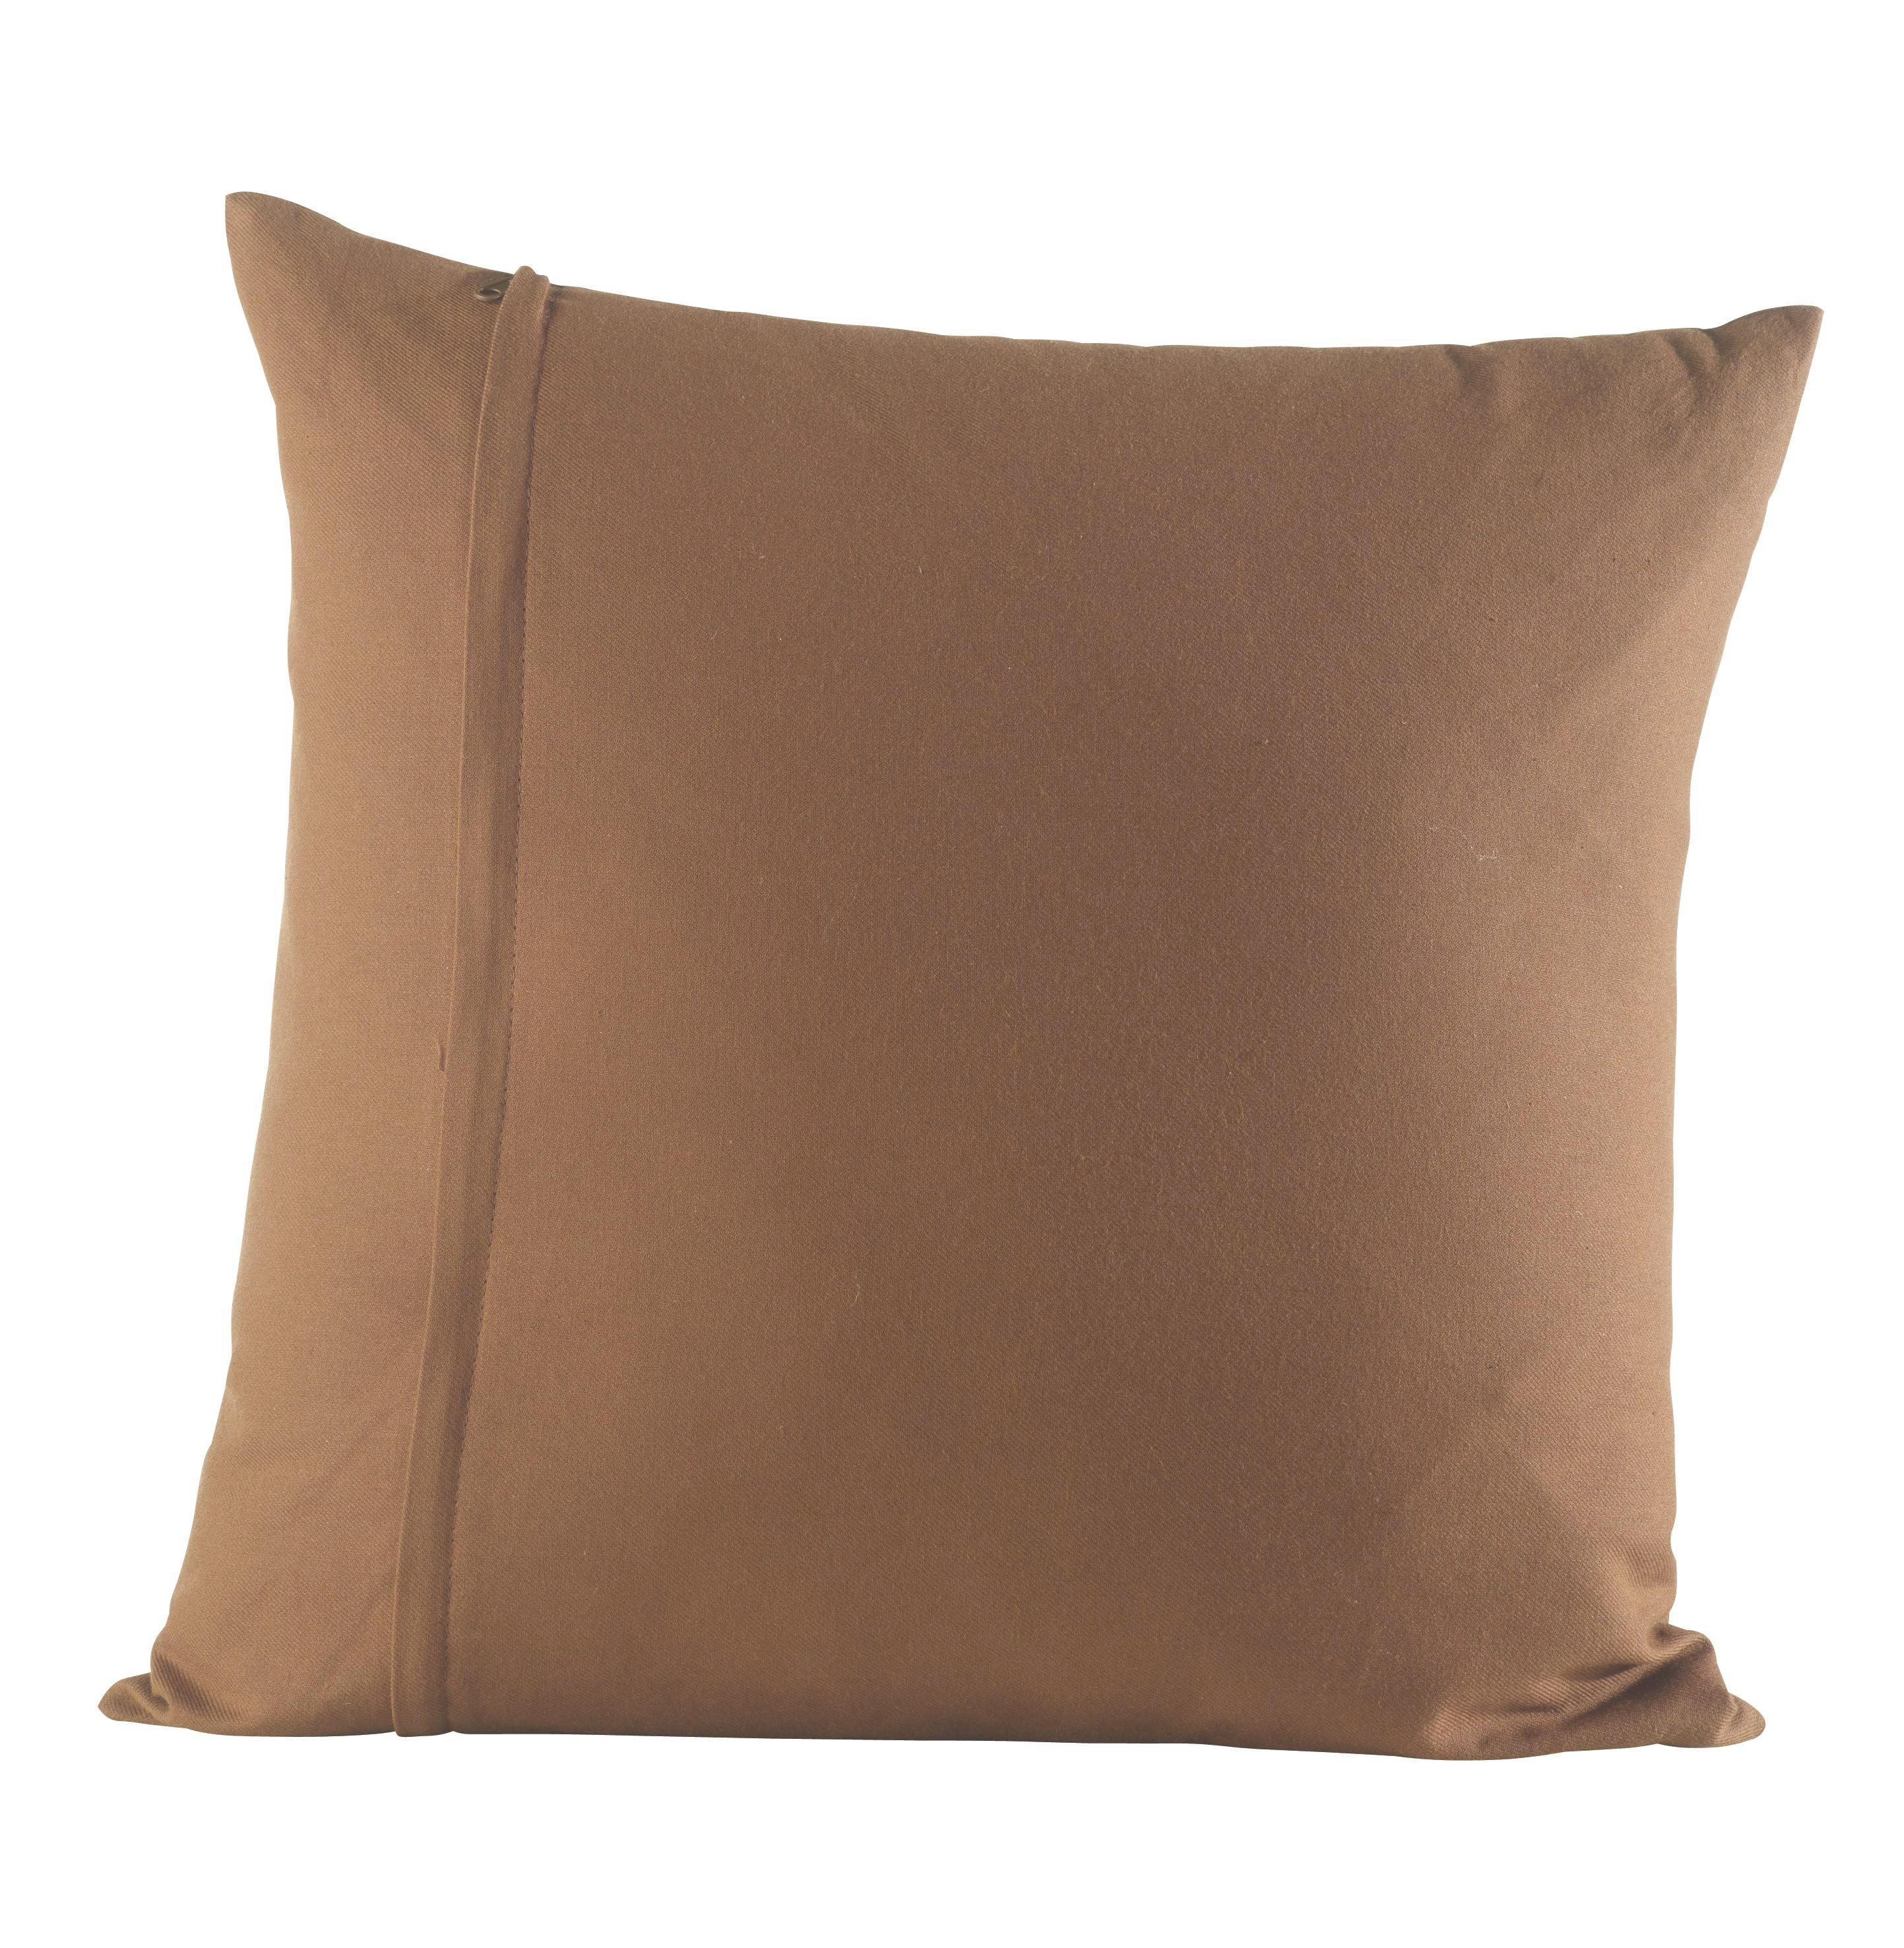 Díszpárna Zippmex - barna, textil (50/50cm) - BASED